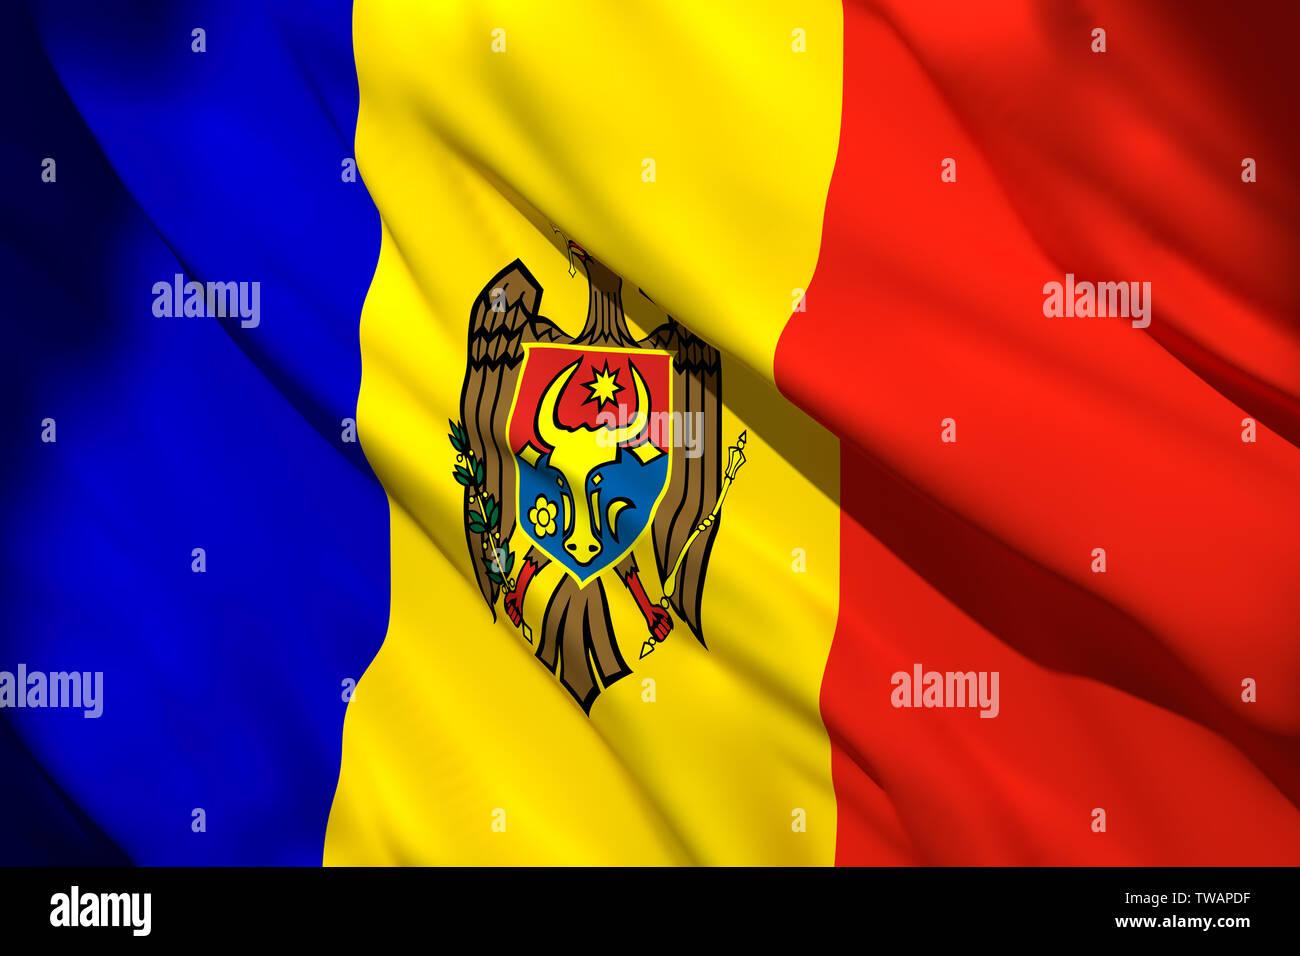 REPUBLIC OF MOLDOVA MOLDOVAN MOLDAVIAN NATIONAL FLAG Sew on Patch